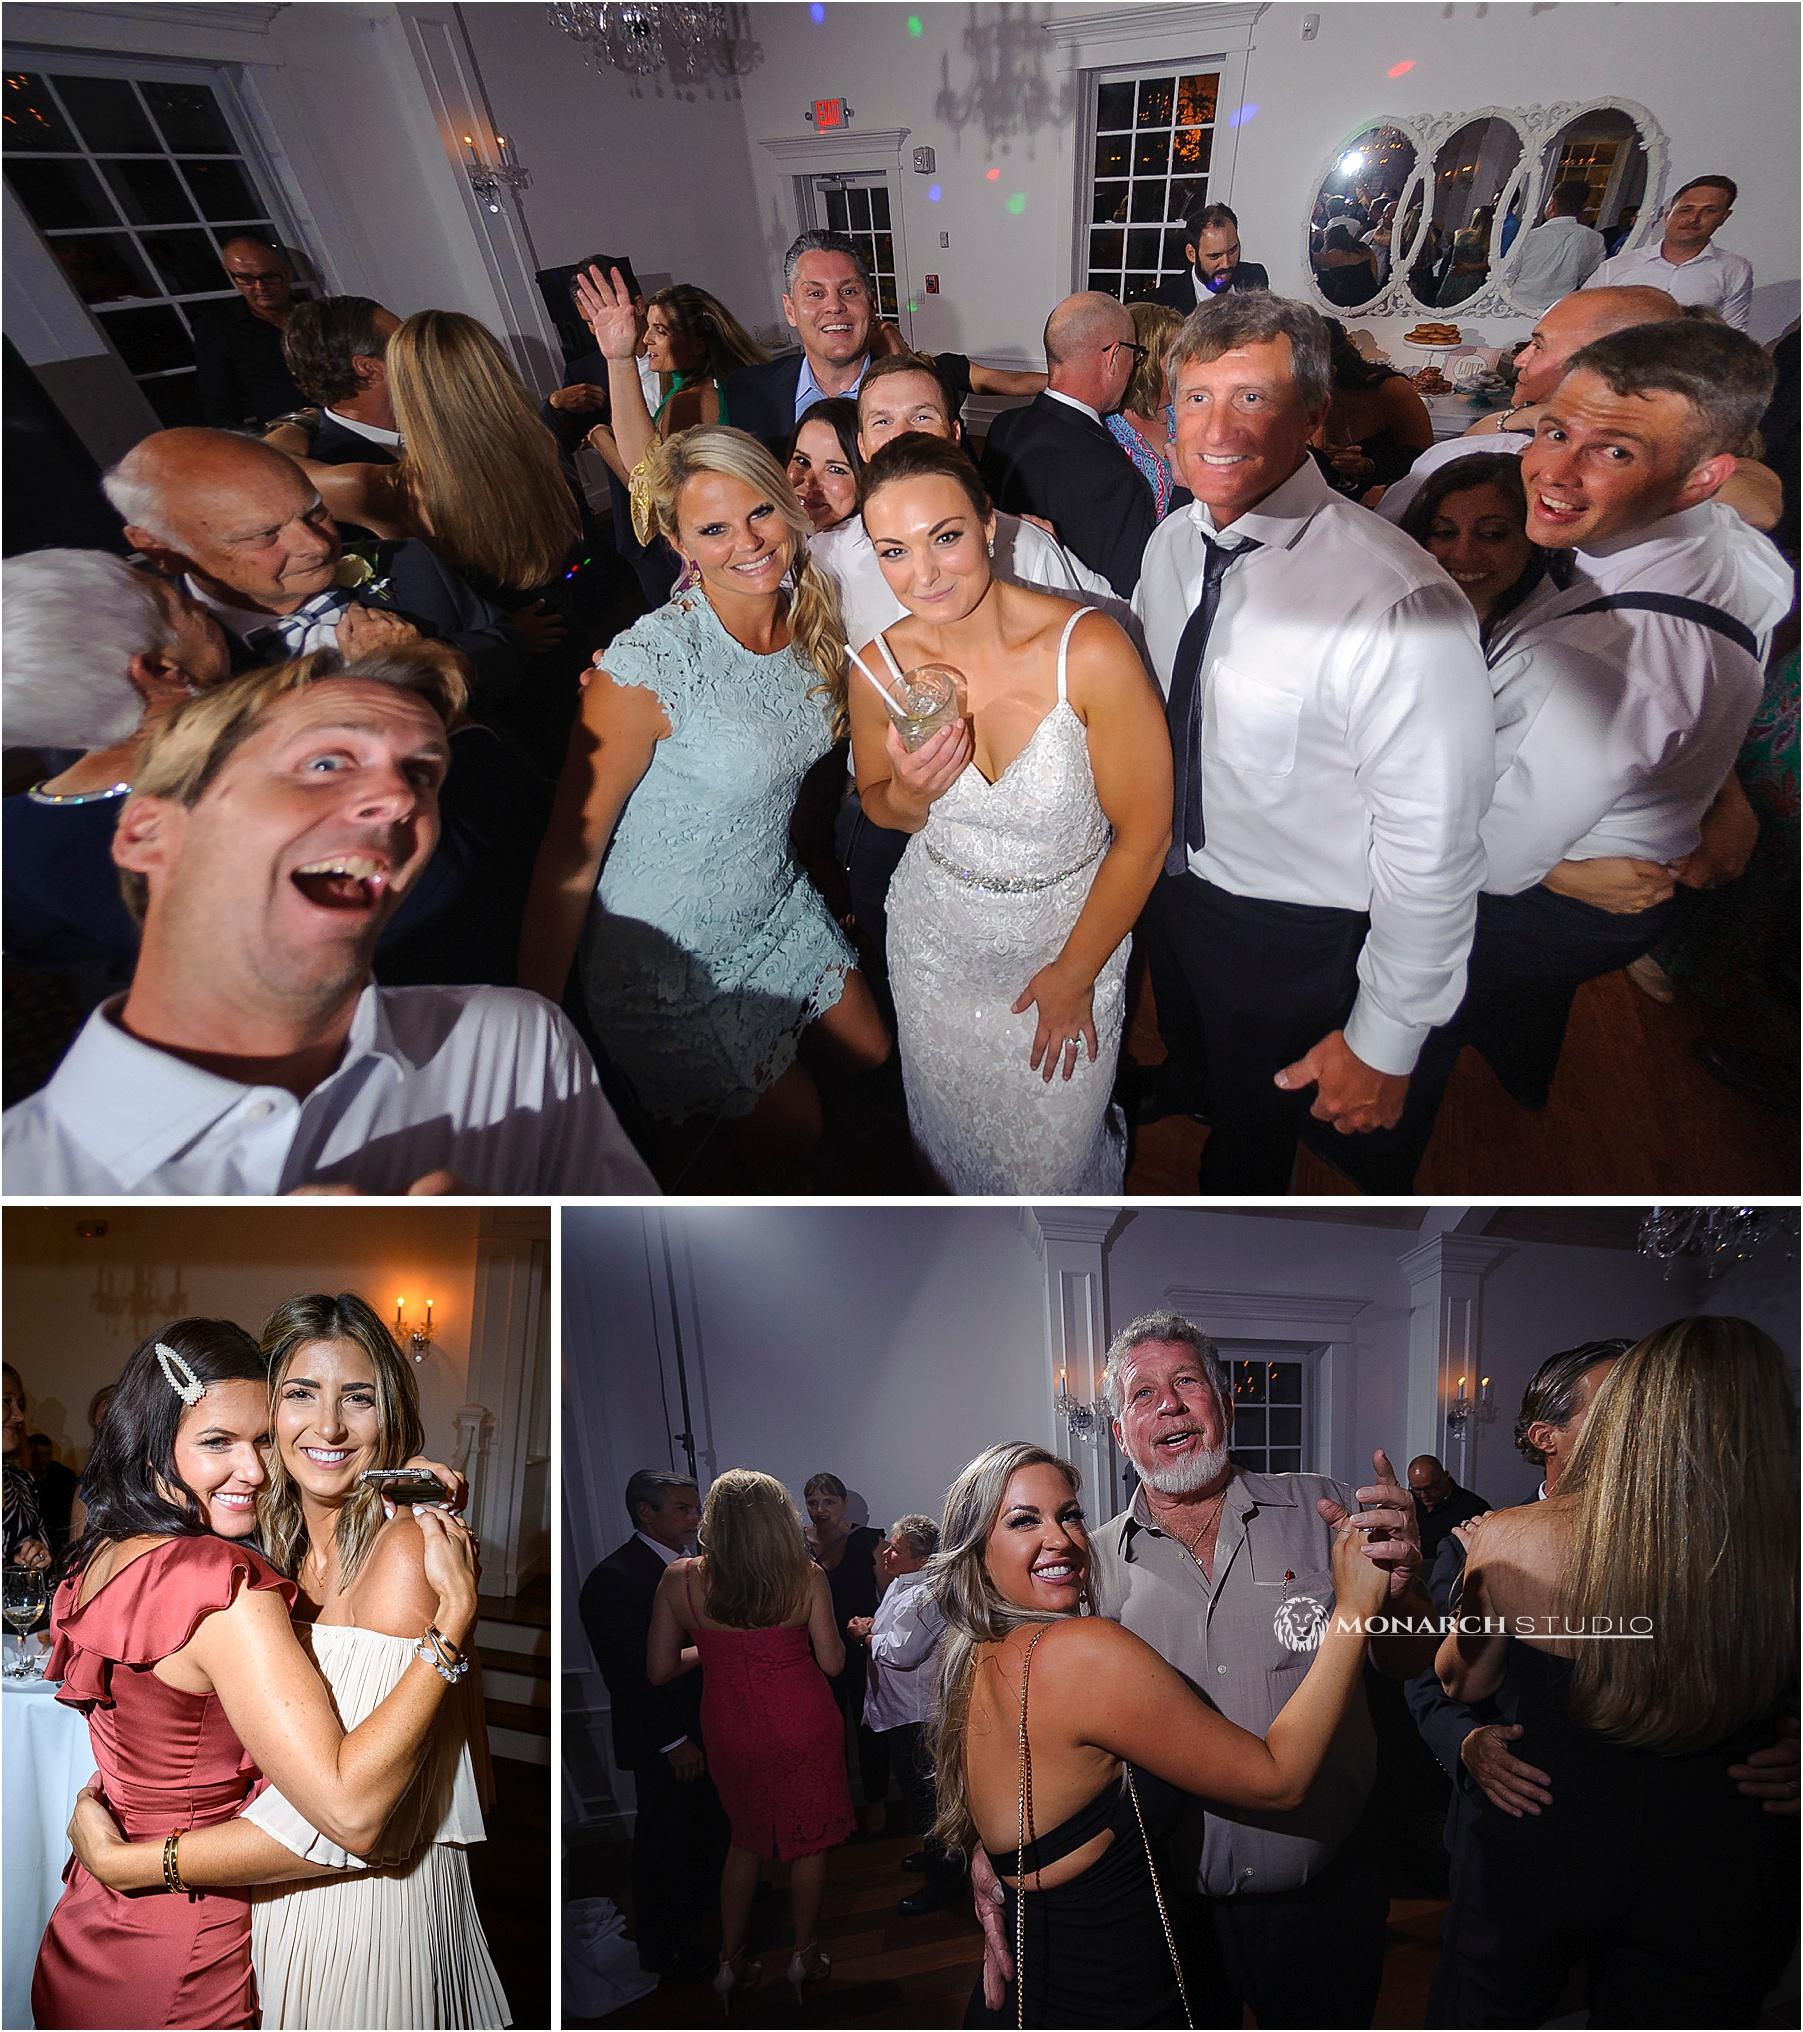 117-whiteroom-wedding-photographer-2019-05-22_0099.jpg